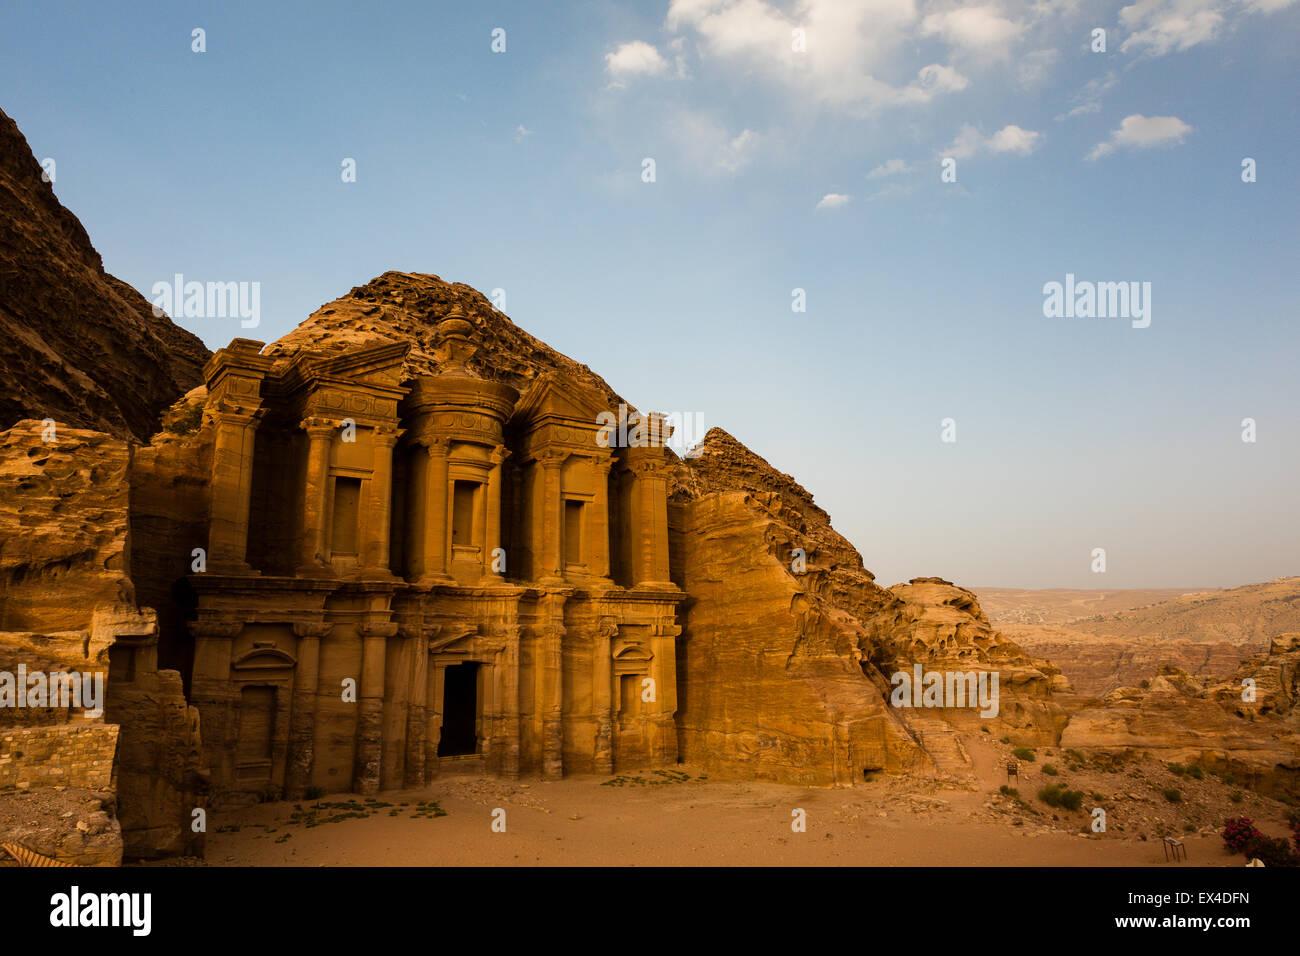 Petra, Jordan, 8th June. Deserted view of Petra's monastery just before sunset. - Stock Image